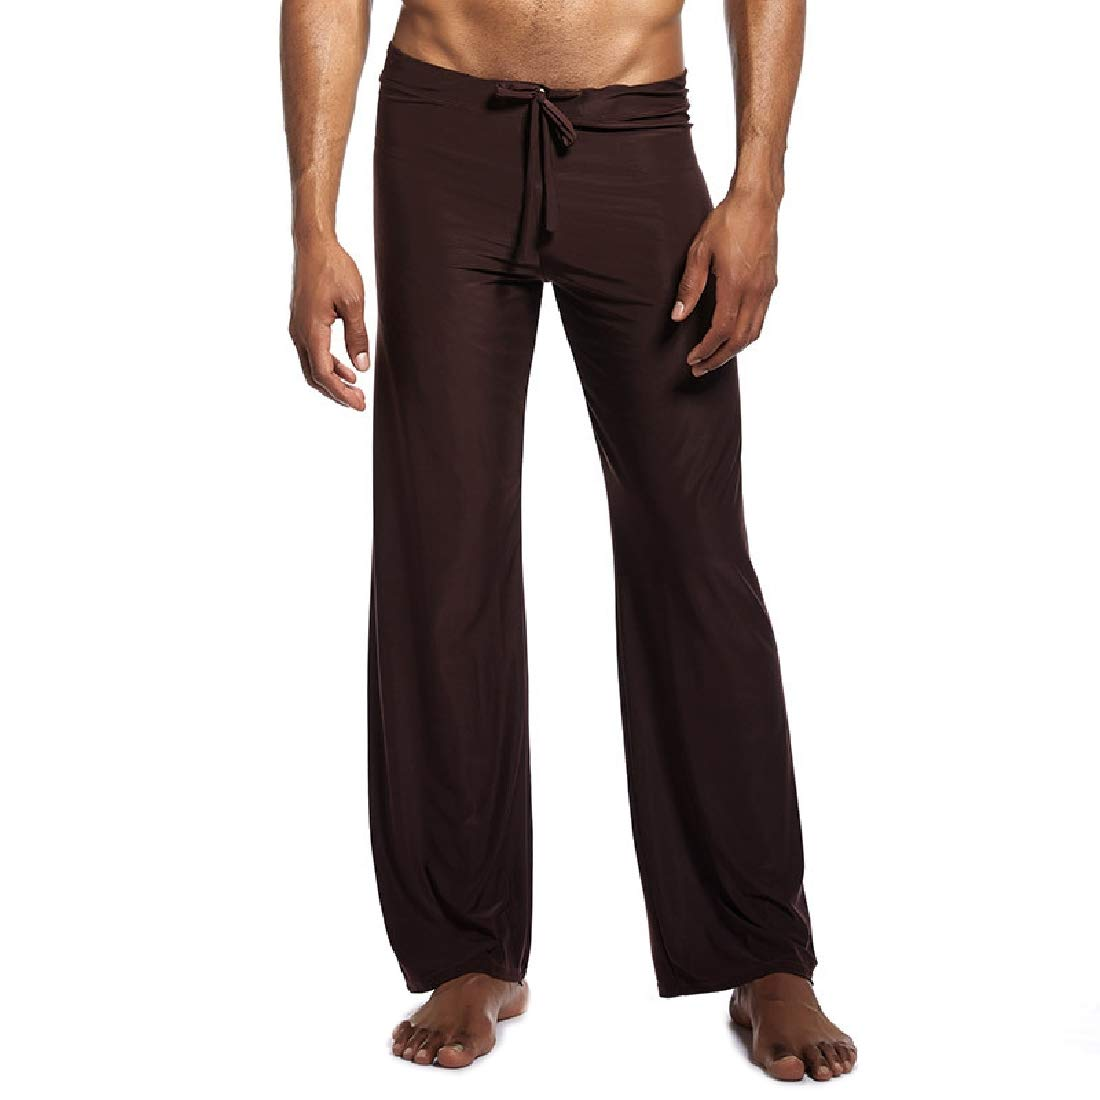 Men Ice Silk Solid Color Plus Size Lounge Pants Yoga Pajama Pants